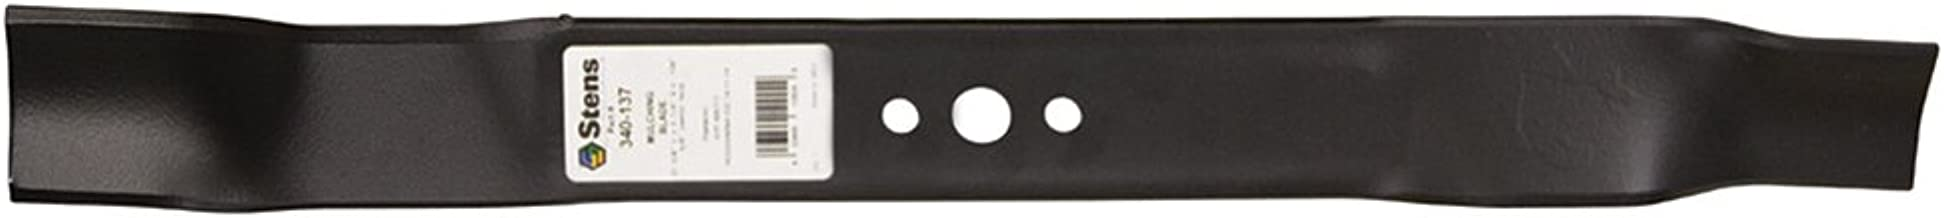 Stens Mulching Blade, AYP 532406713, ea, 1